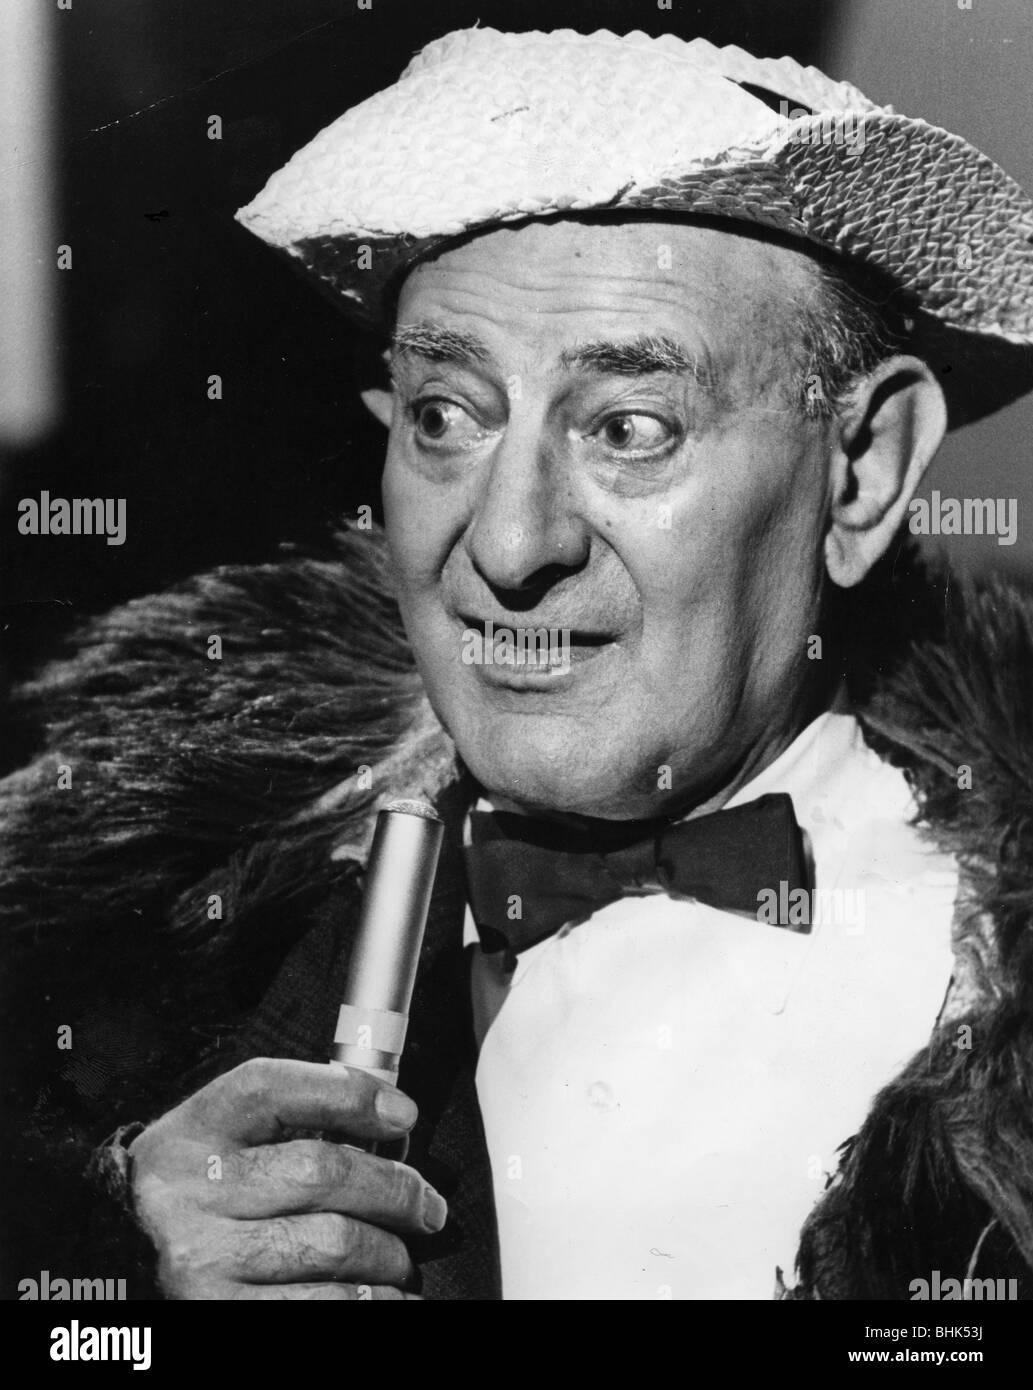 Bud Flanagan (1895-1968), British singer and entertainer. - Stock Image